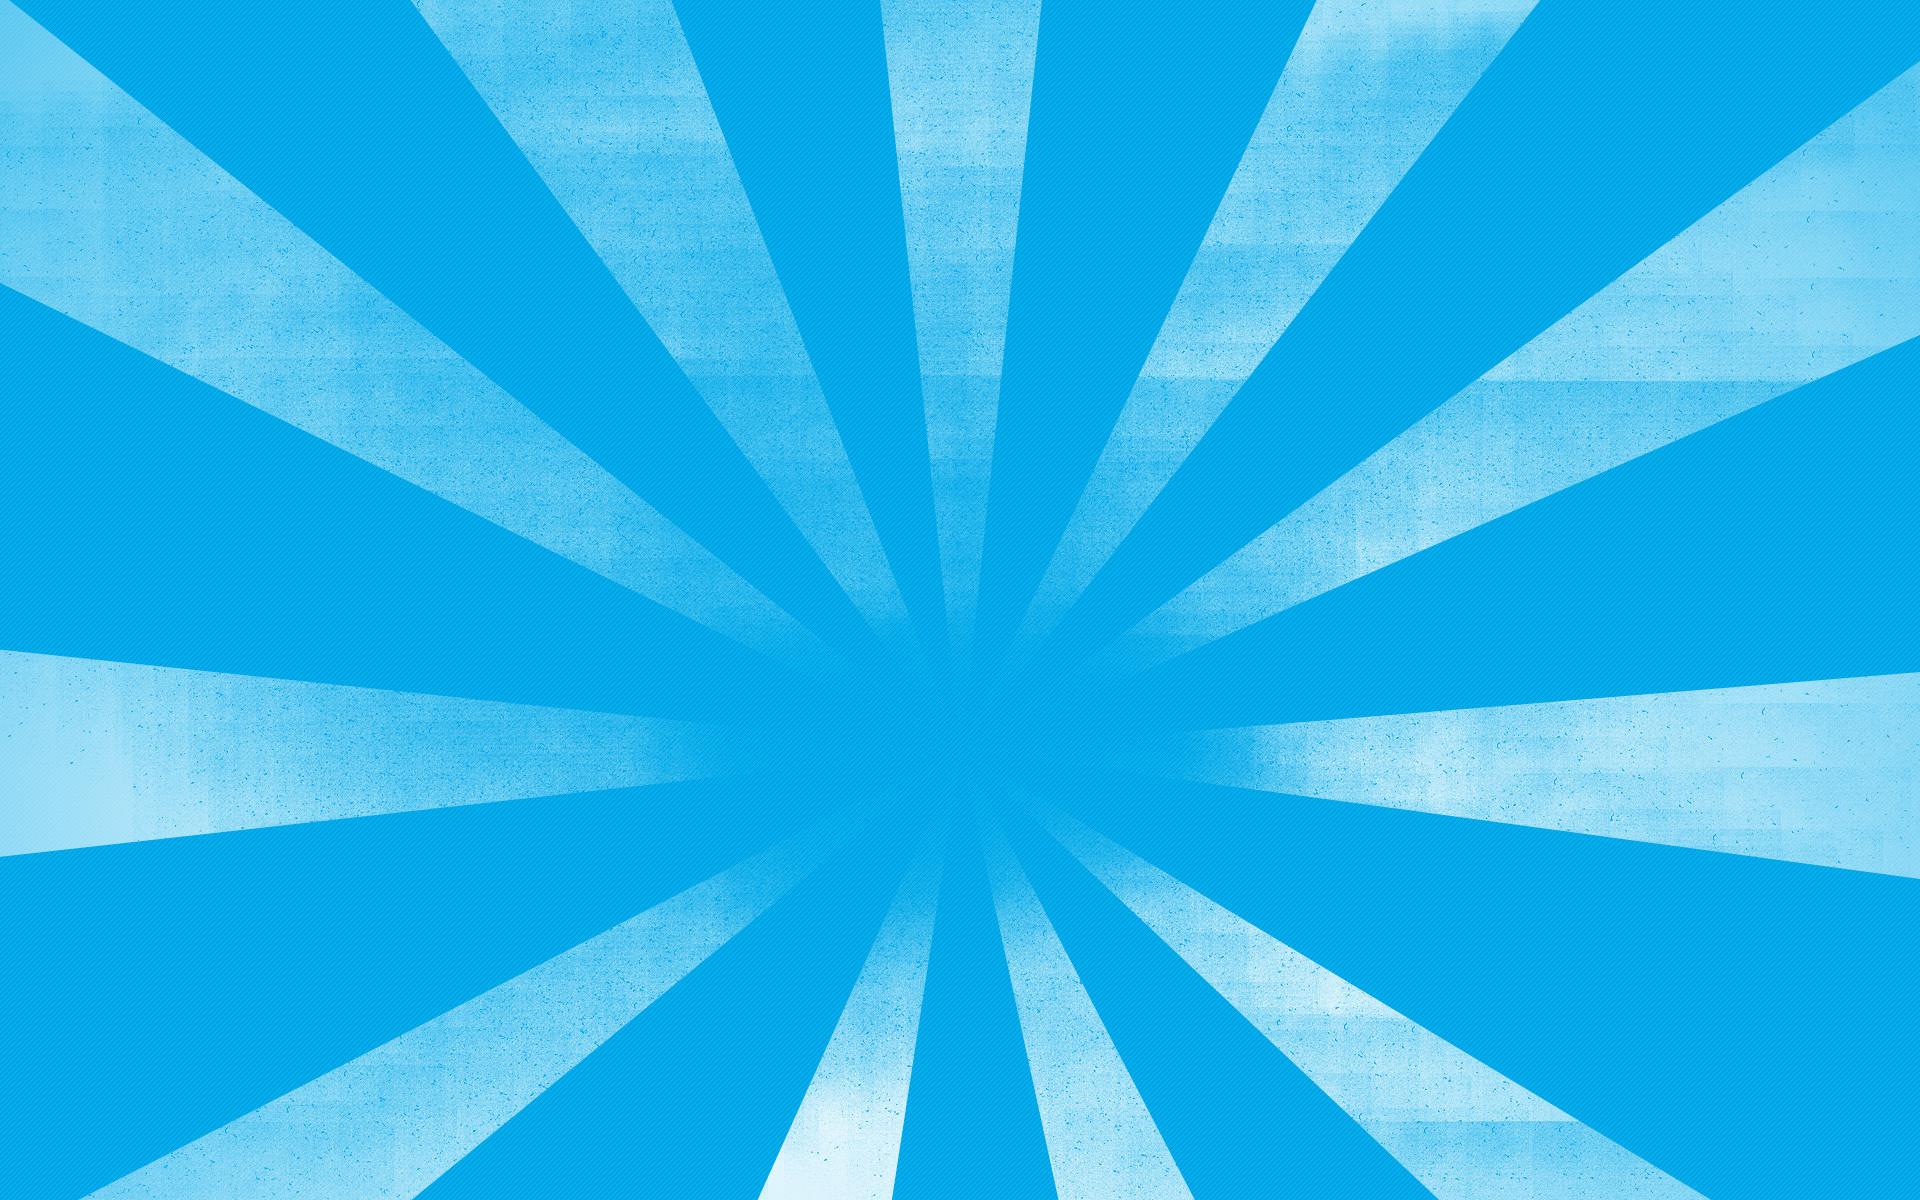 Light Blue Wallpaper Designs. 7 Best Images of Cool Blue Wallpaper Designs Light  Blue Girly